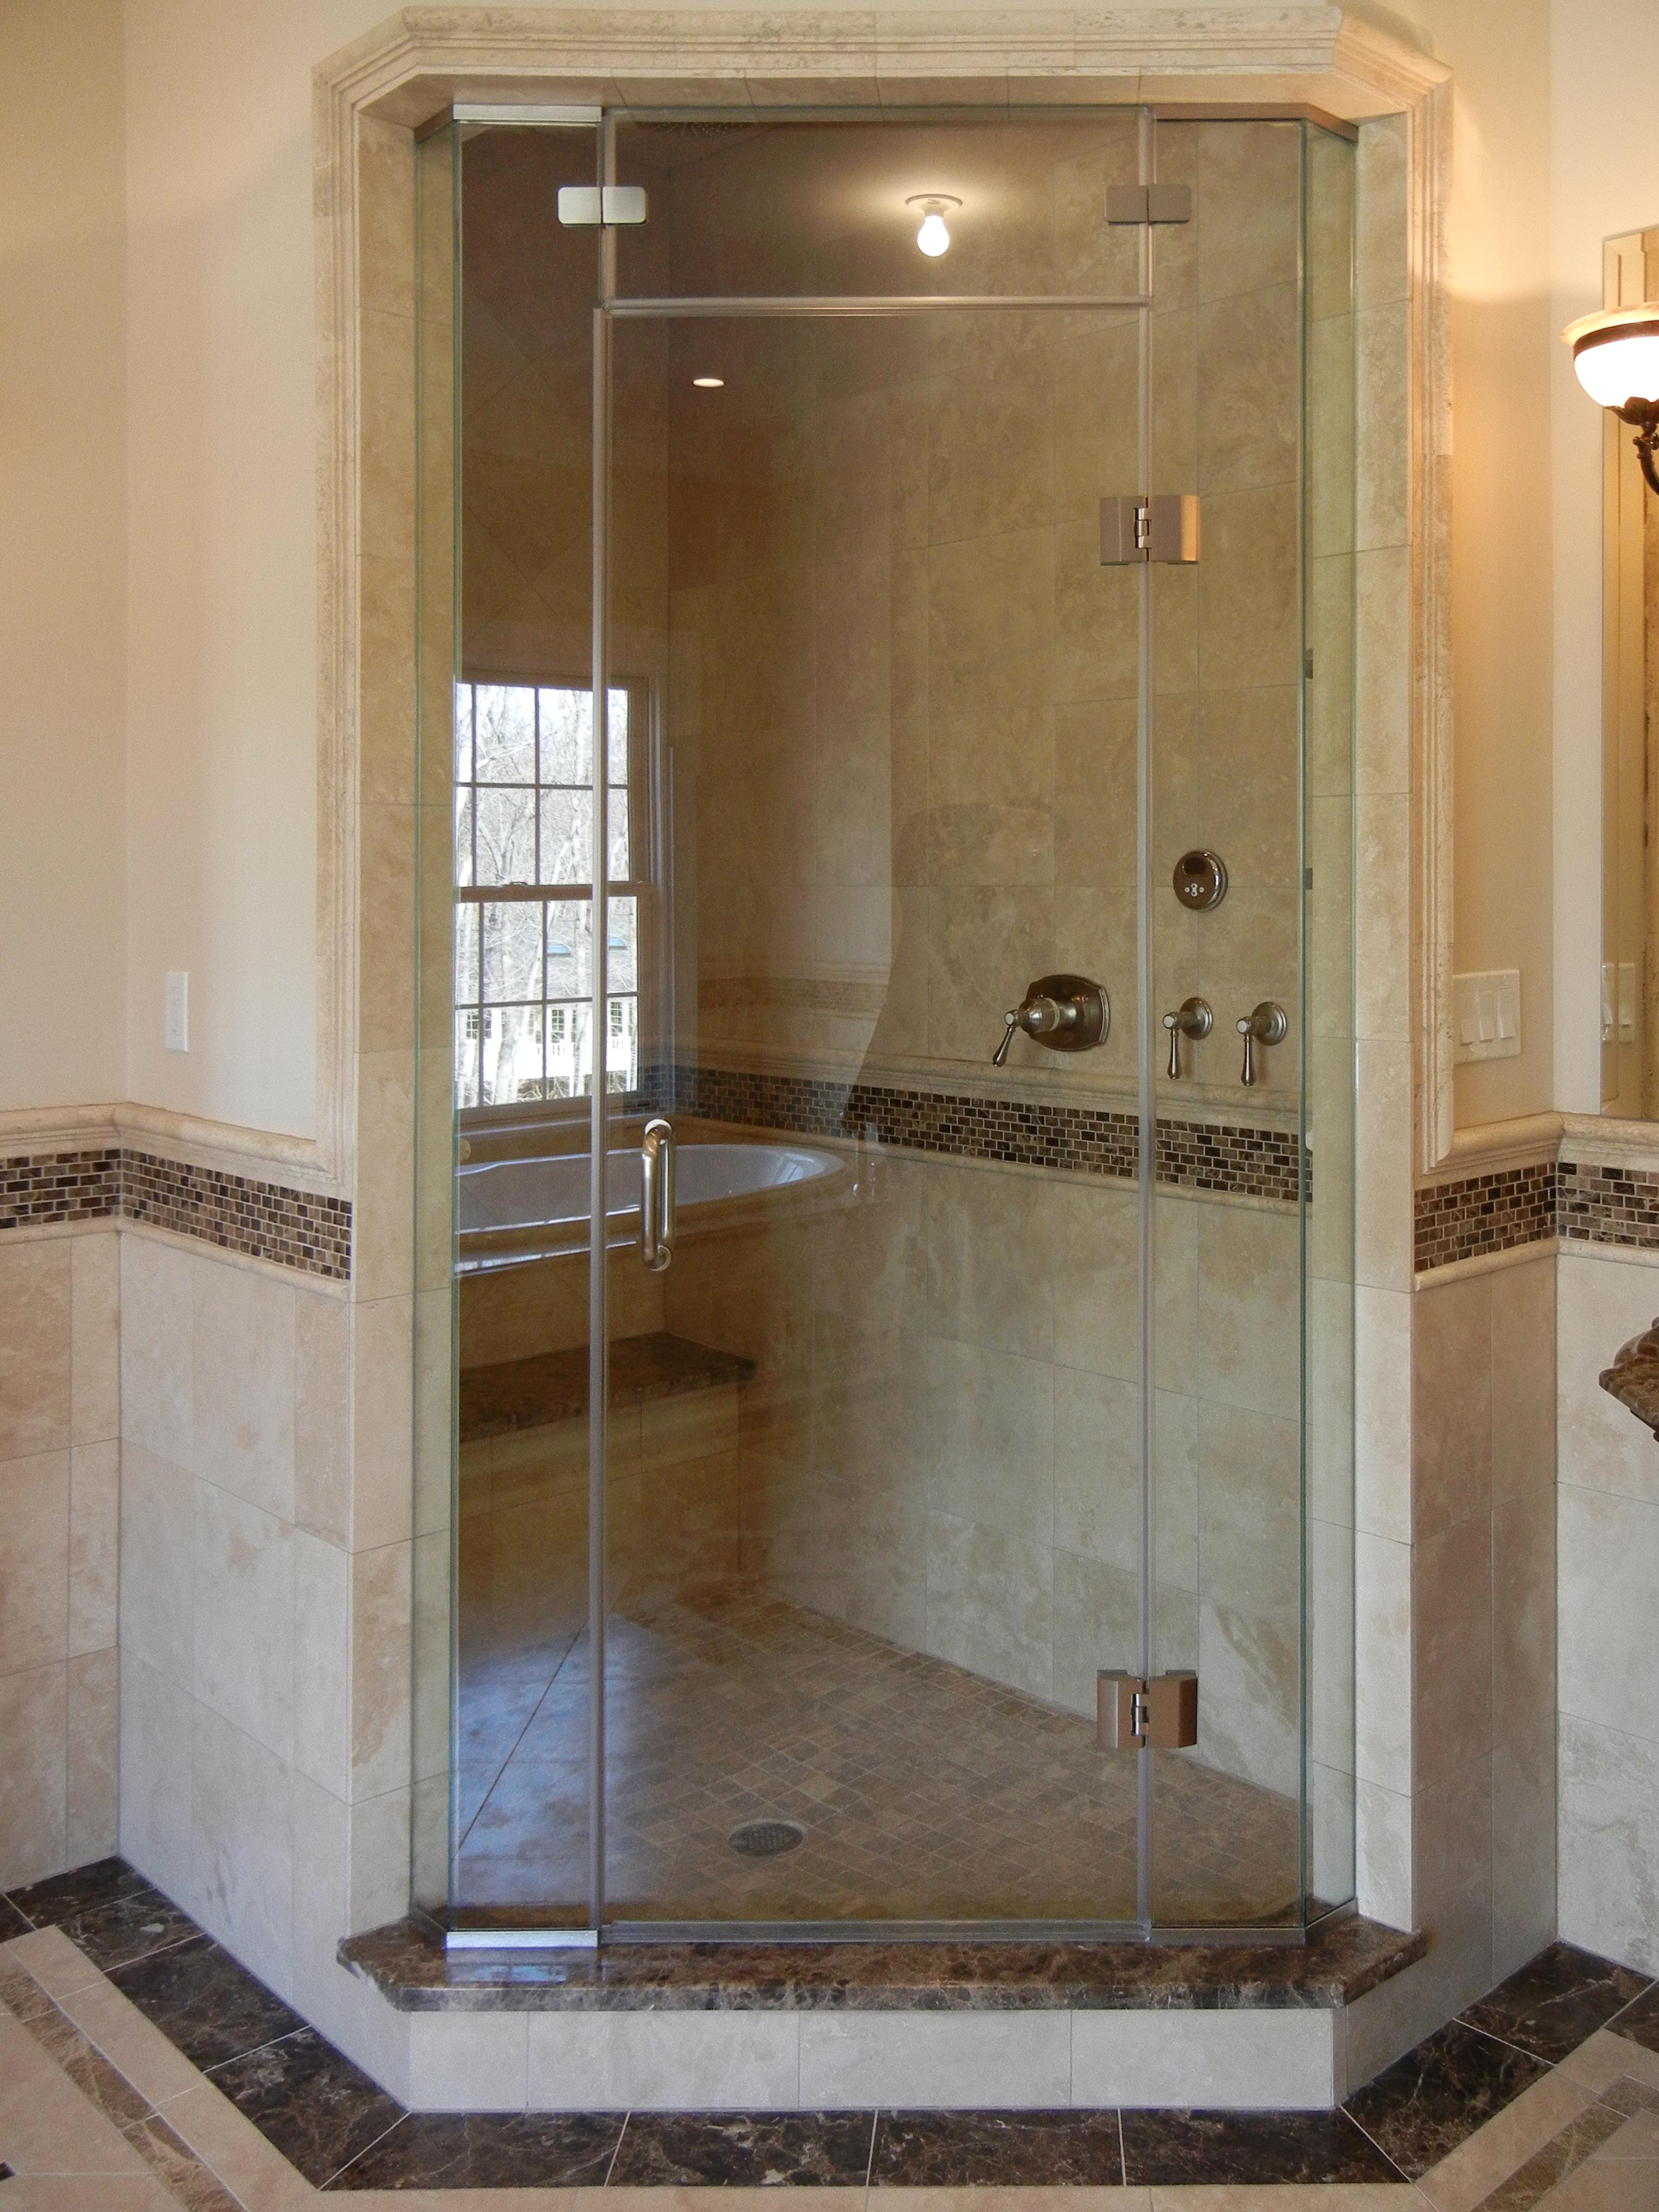 7 - Steam frameless shower door